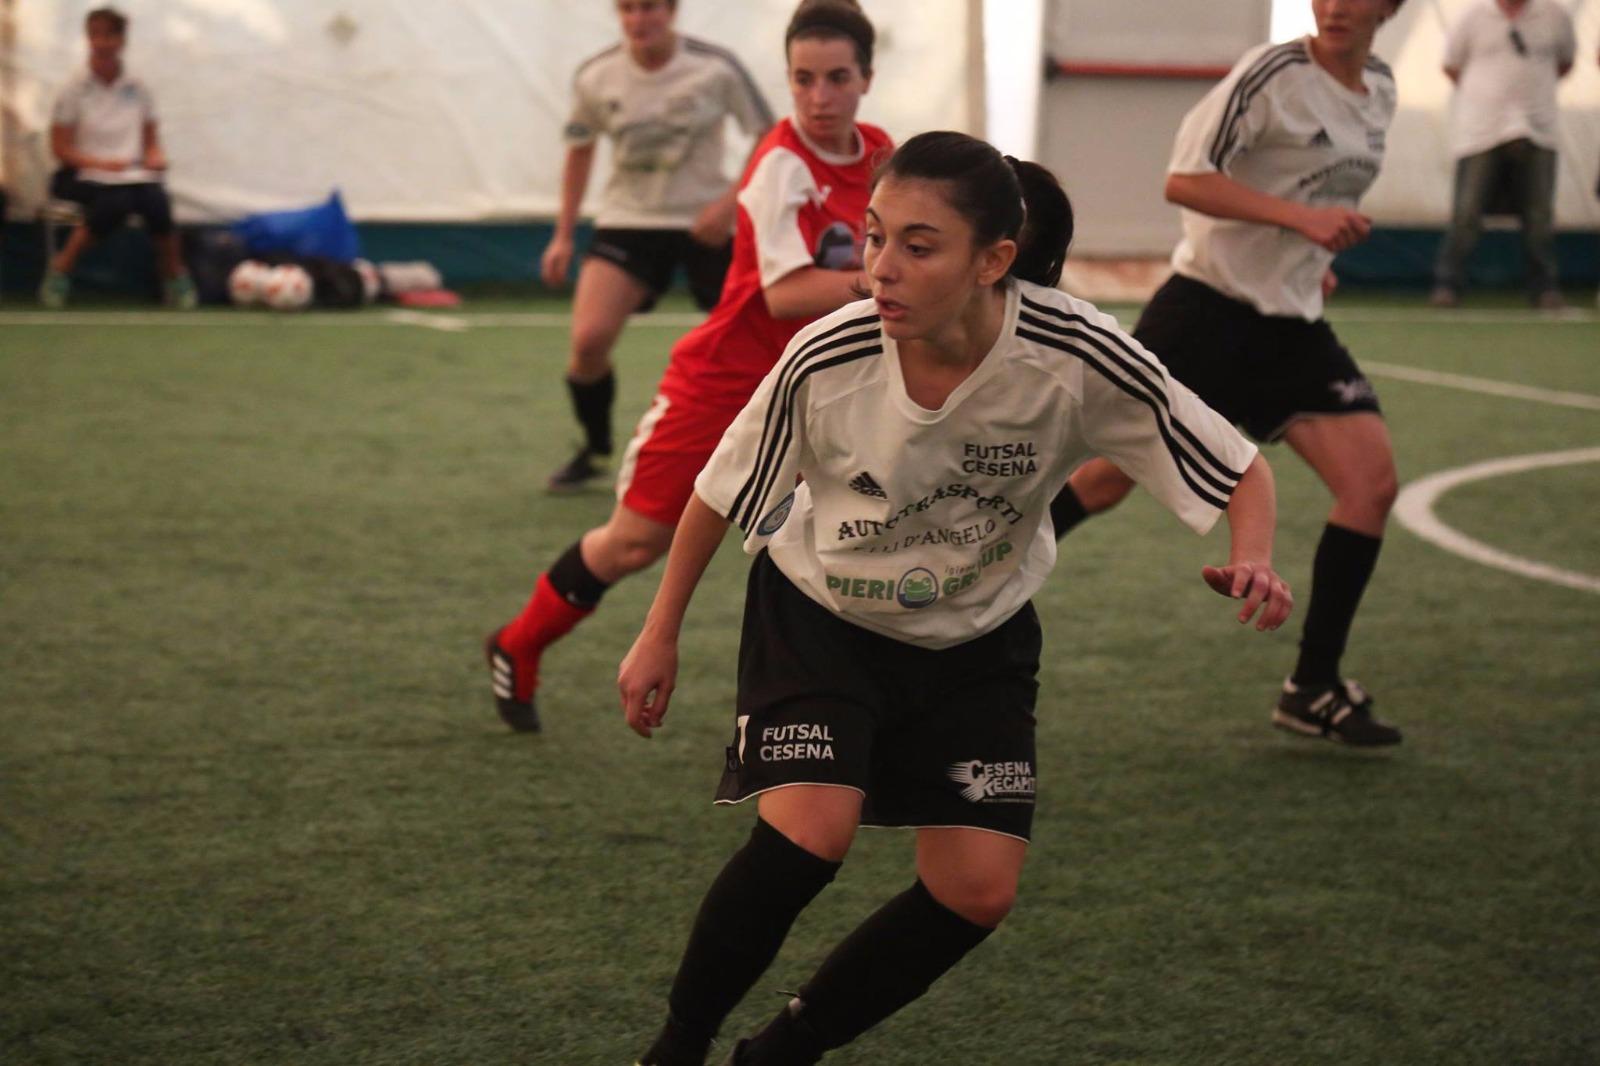 3° Coppa – Futsal Cesena-San Marino femminile 8-2